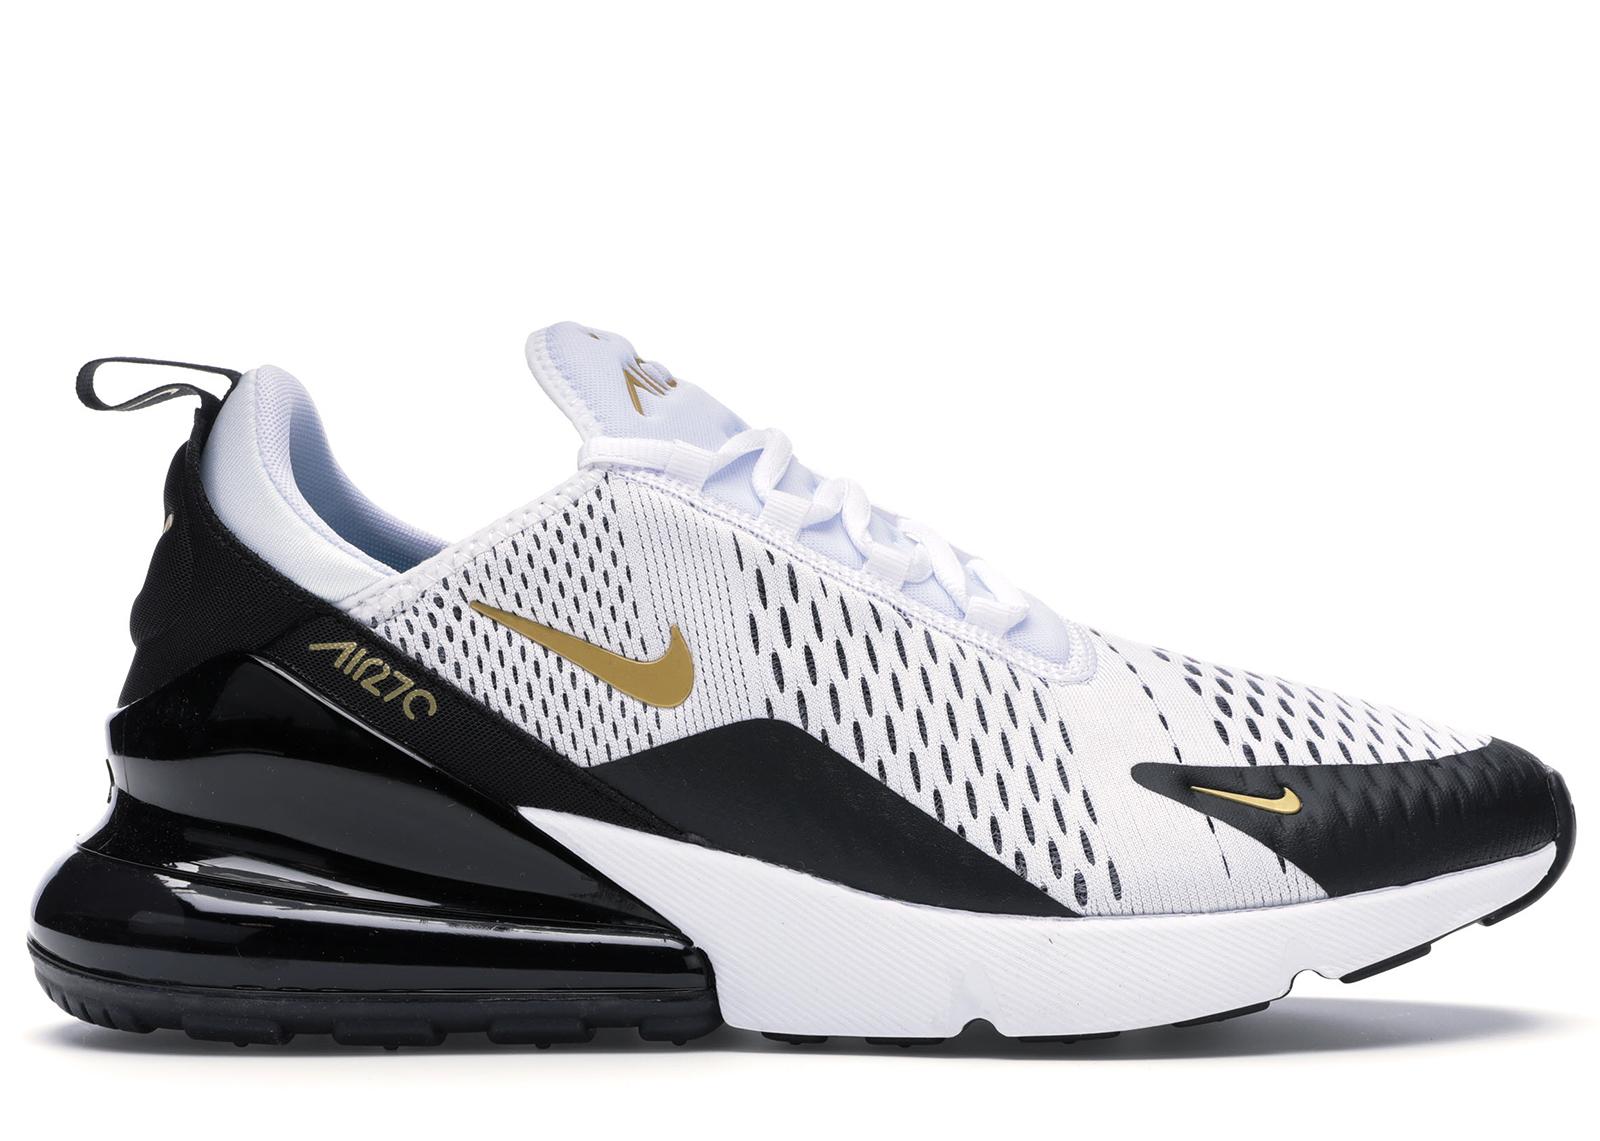 Nike Air Max 270 White Metallic Gold Black